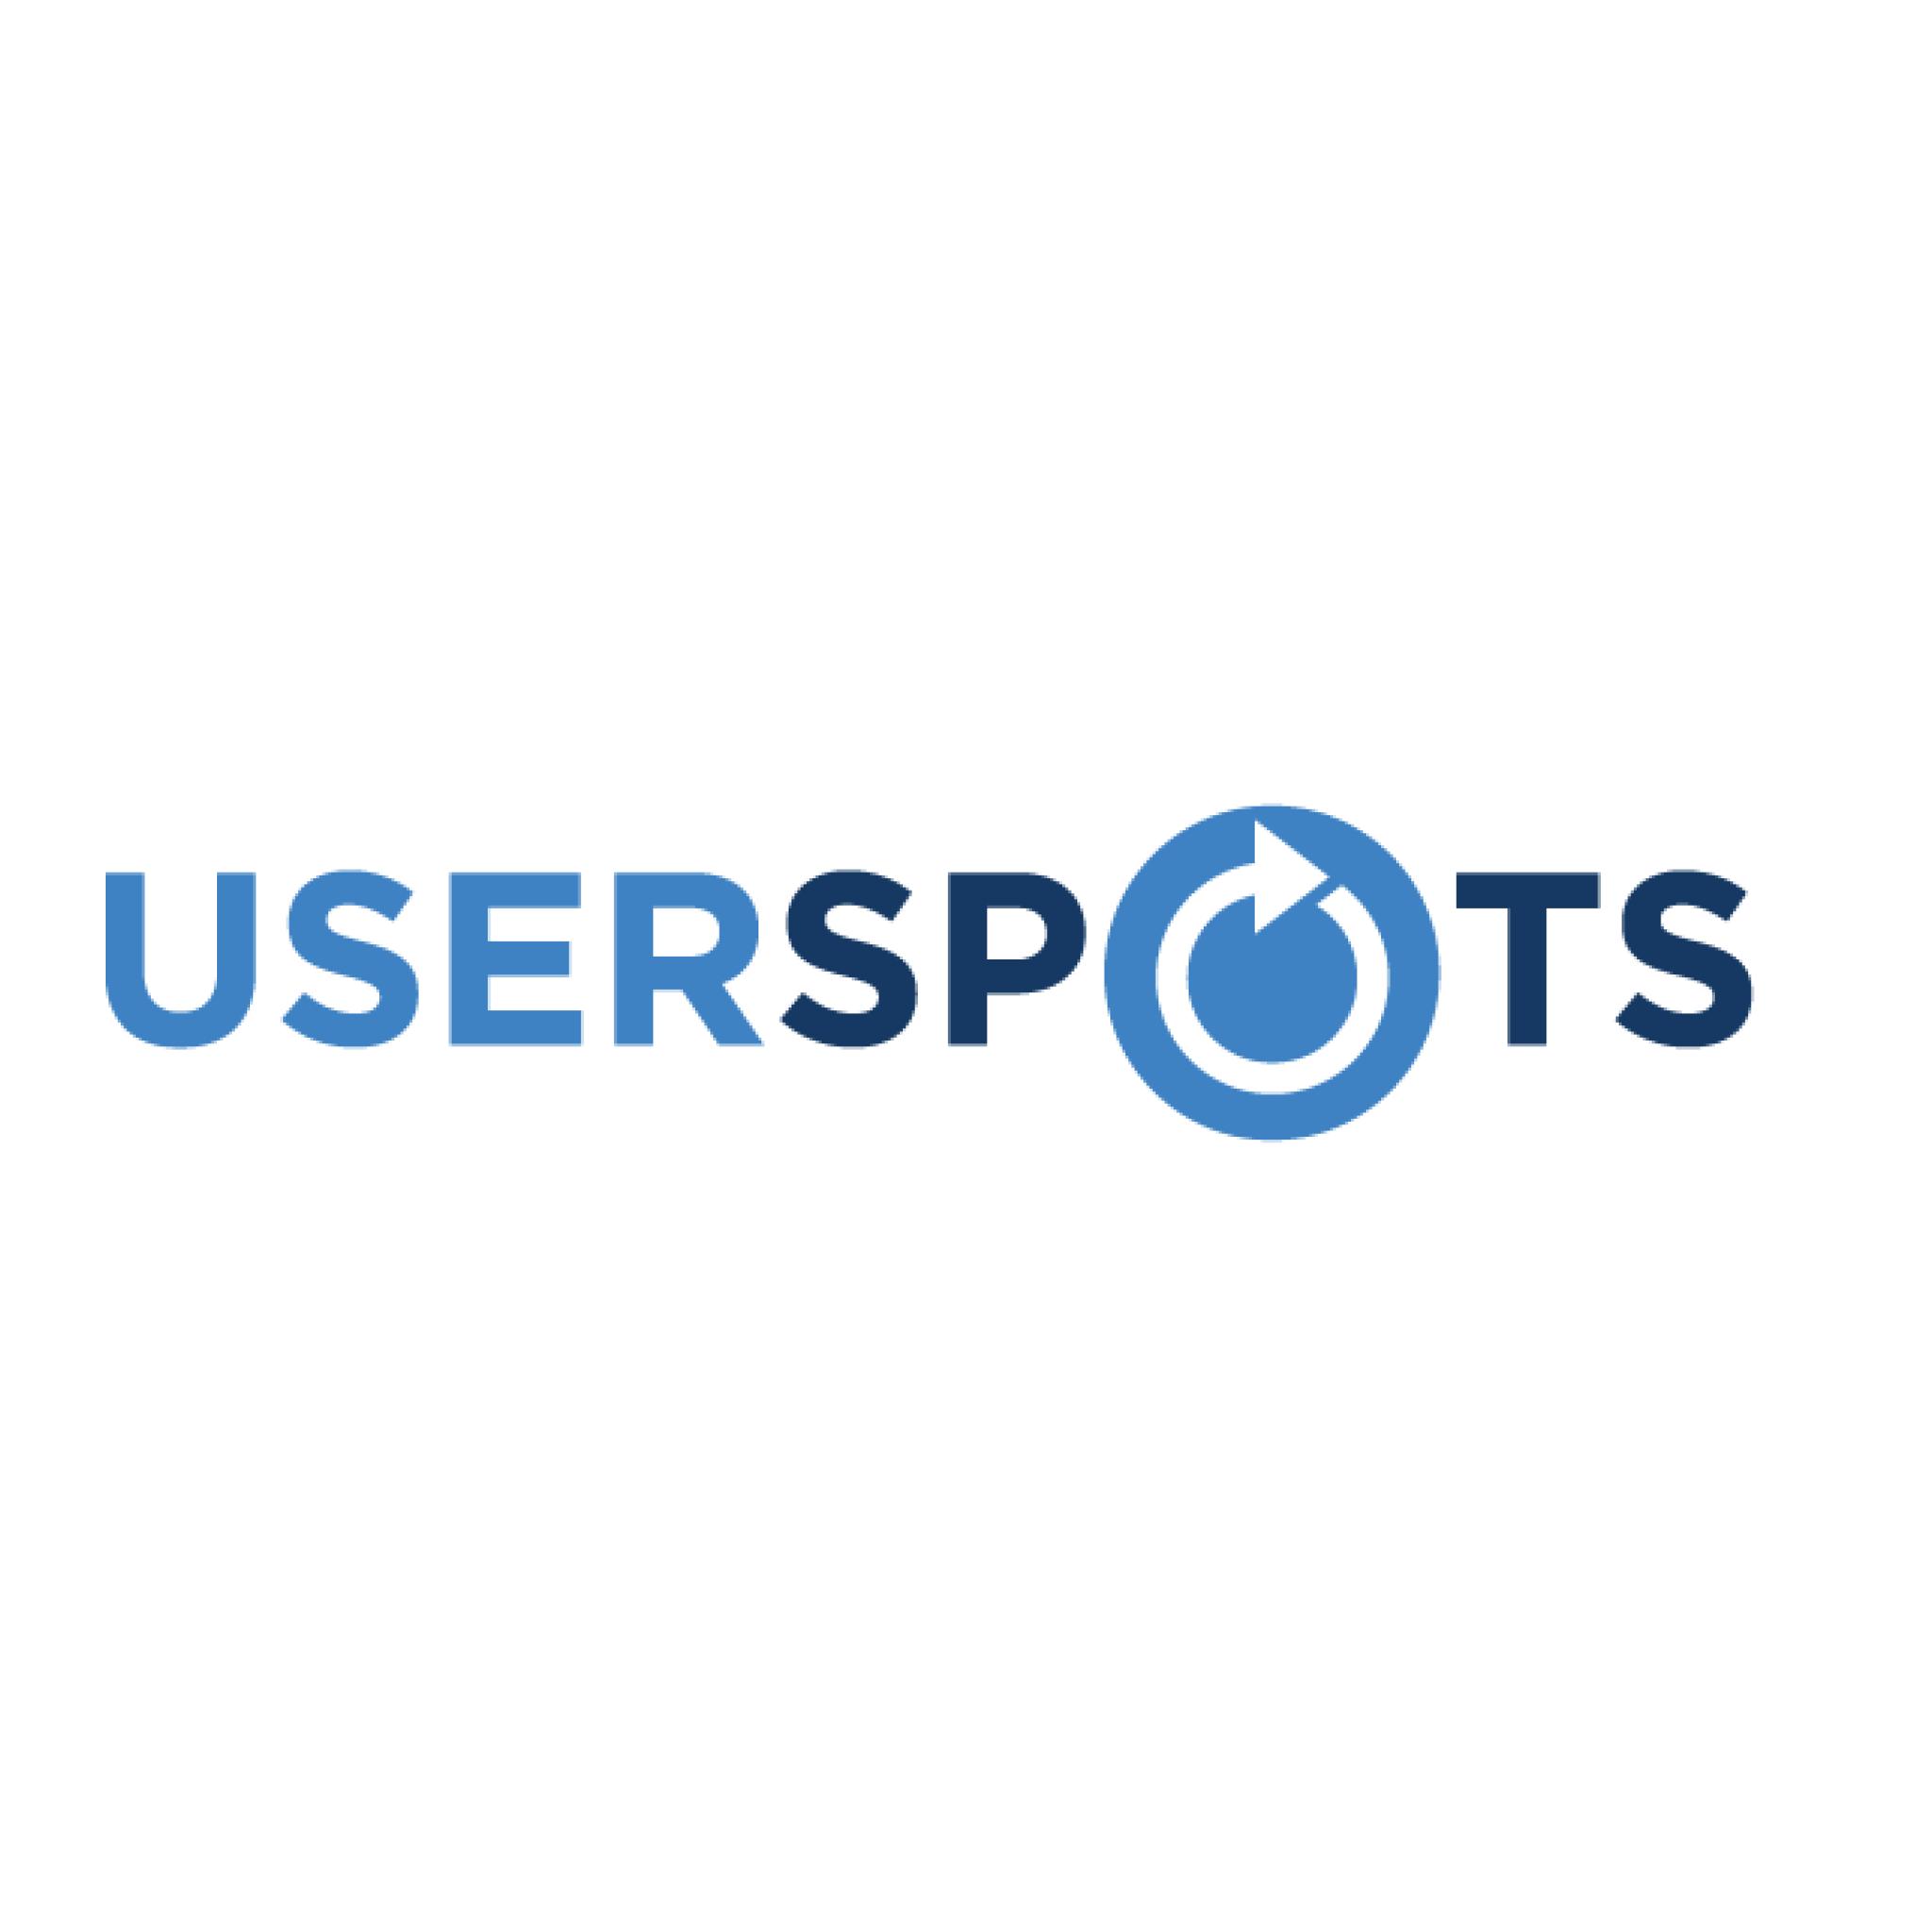 Userspots Ekibi